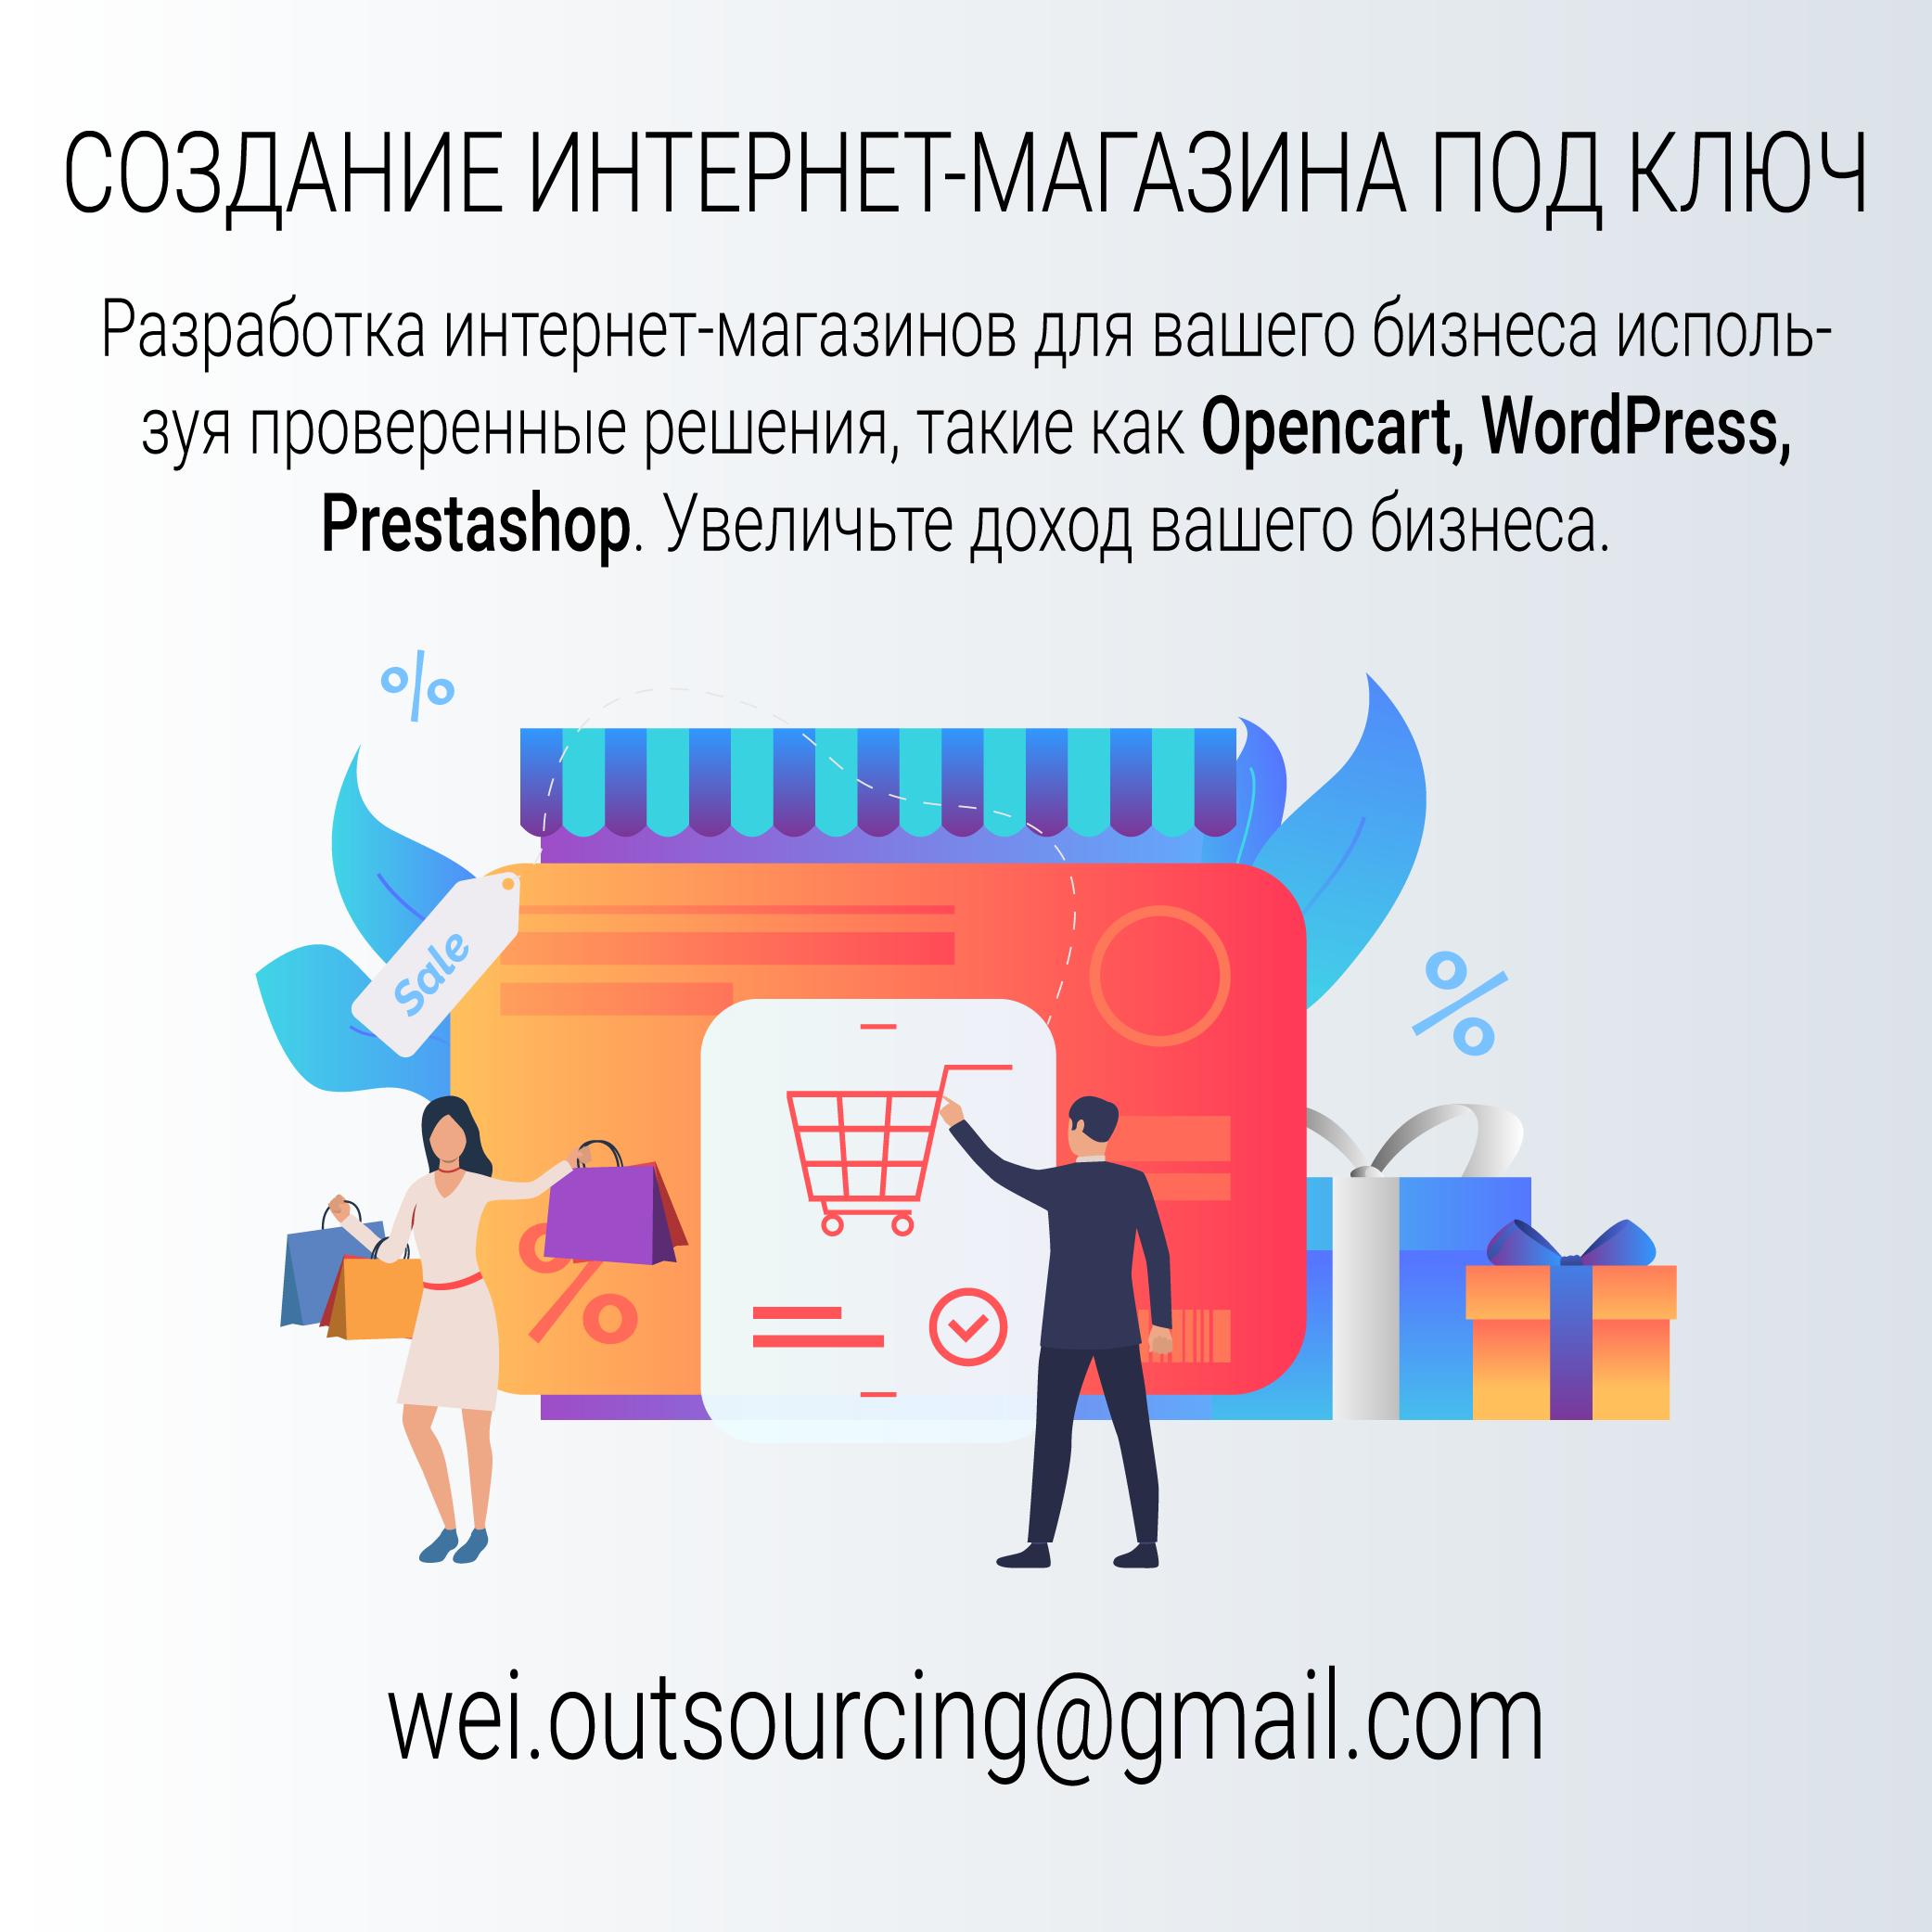 Интернет магазин под ключ Бишкек